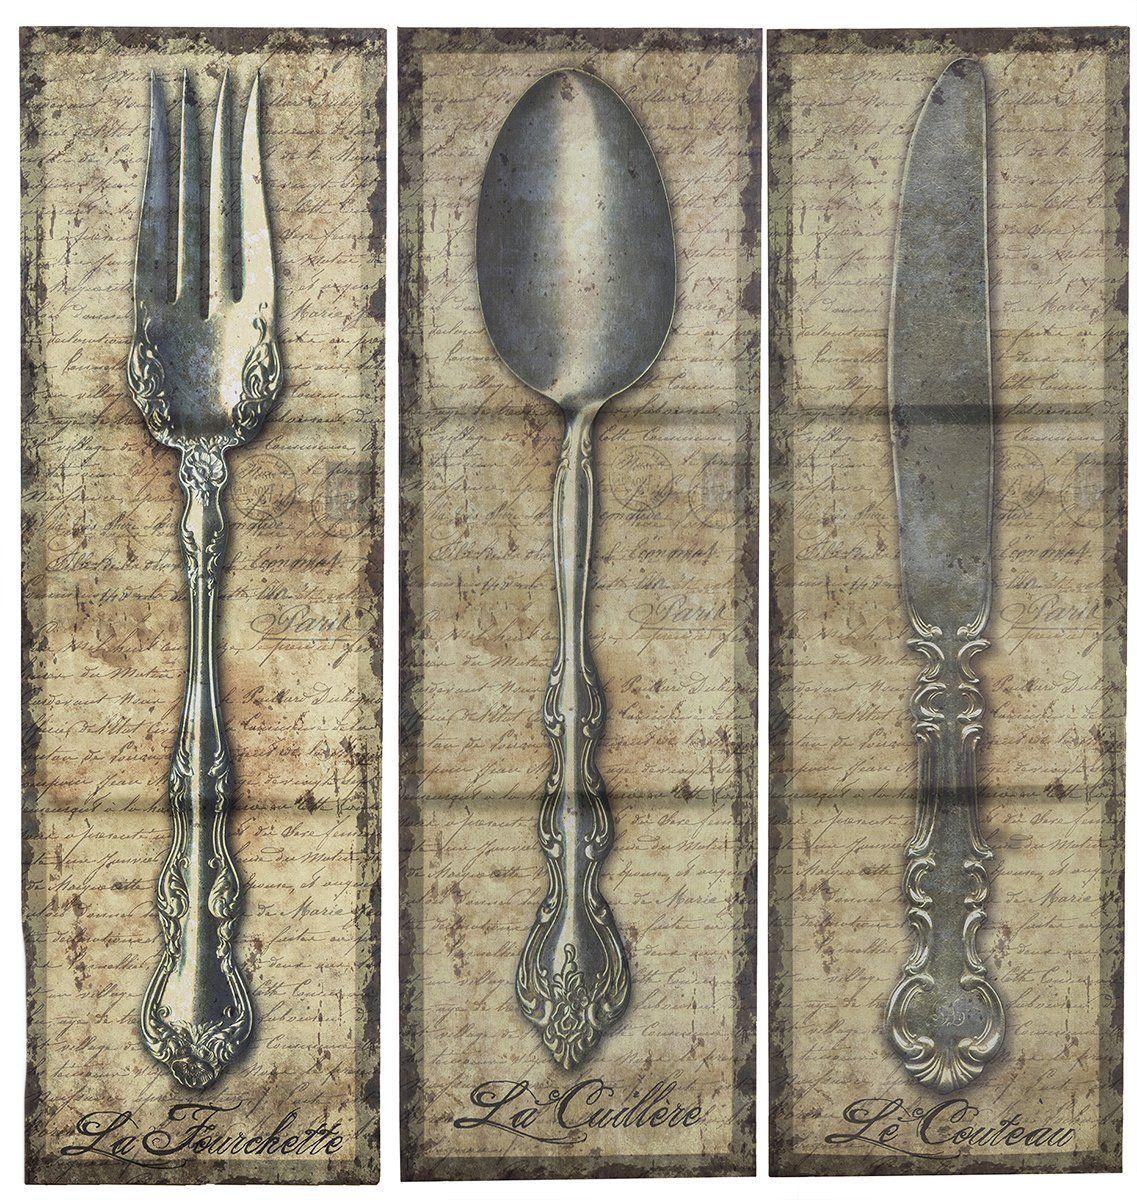 Amazon Com Vintage Kitchen Silverware Canvas Wall Art Spoon Knife Fork Kitchen Artwork For Wall Posters Amp Pr Kitchen Artwork Vintage Kitchen Spoon Knife